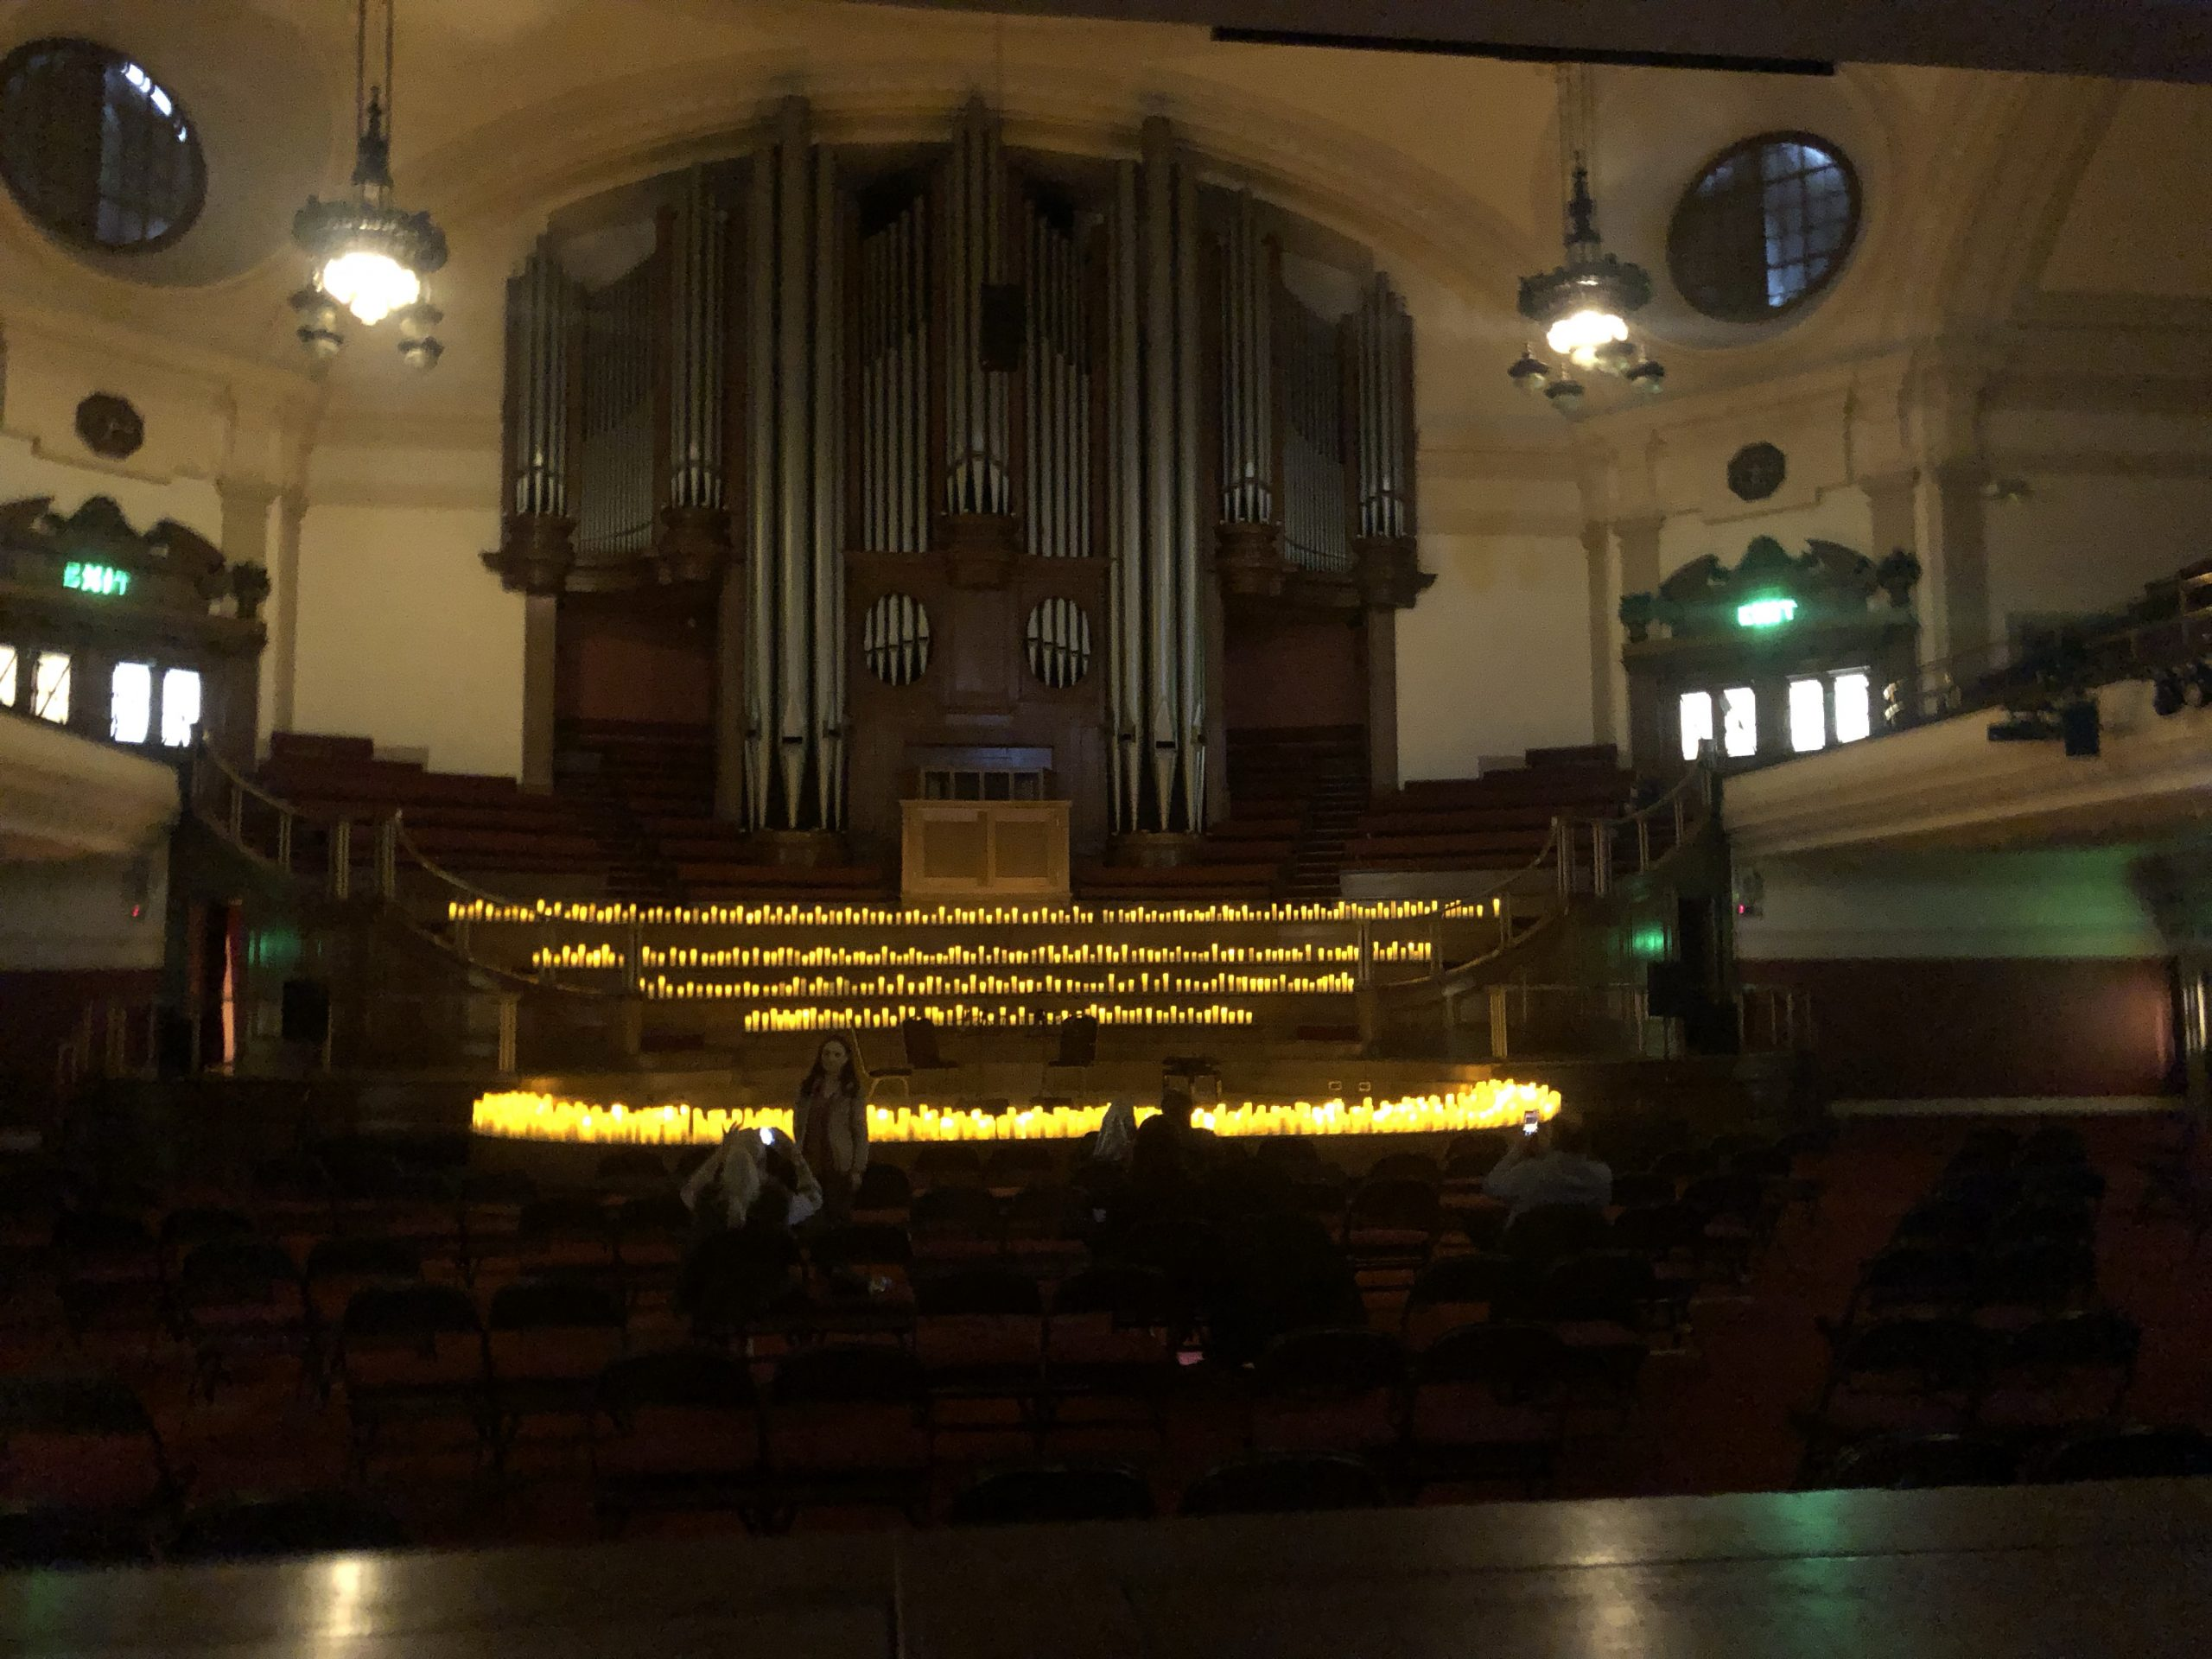 AV Engineer @ A Candlelight Concert (Central Hall Westminster)